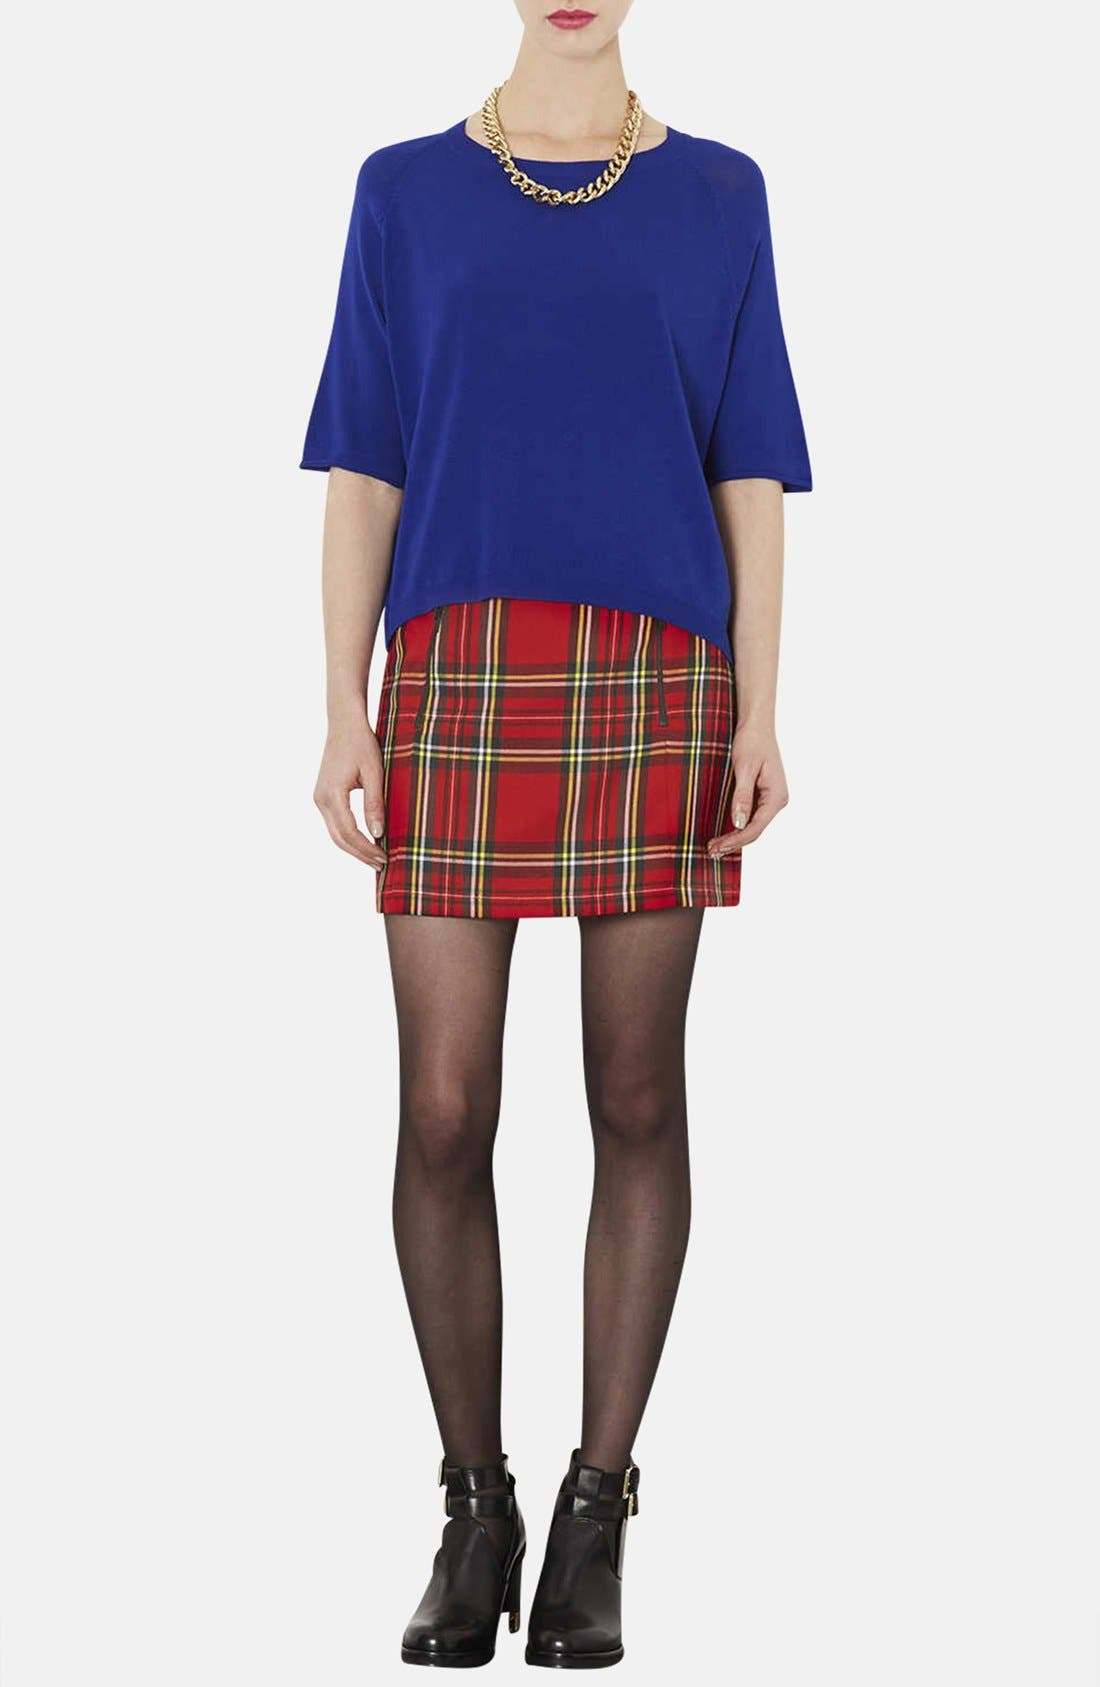 TOPSHOP, Tartan Plaid Skirt, Alternate thumbnail 2, color, 600